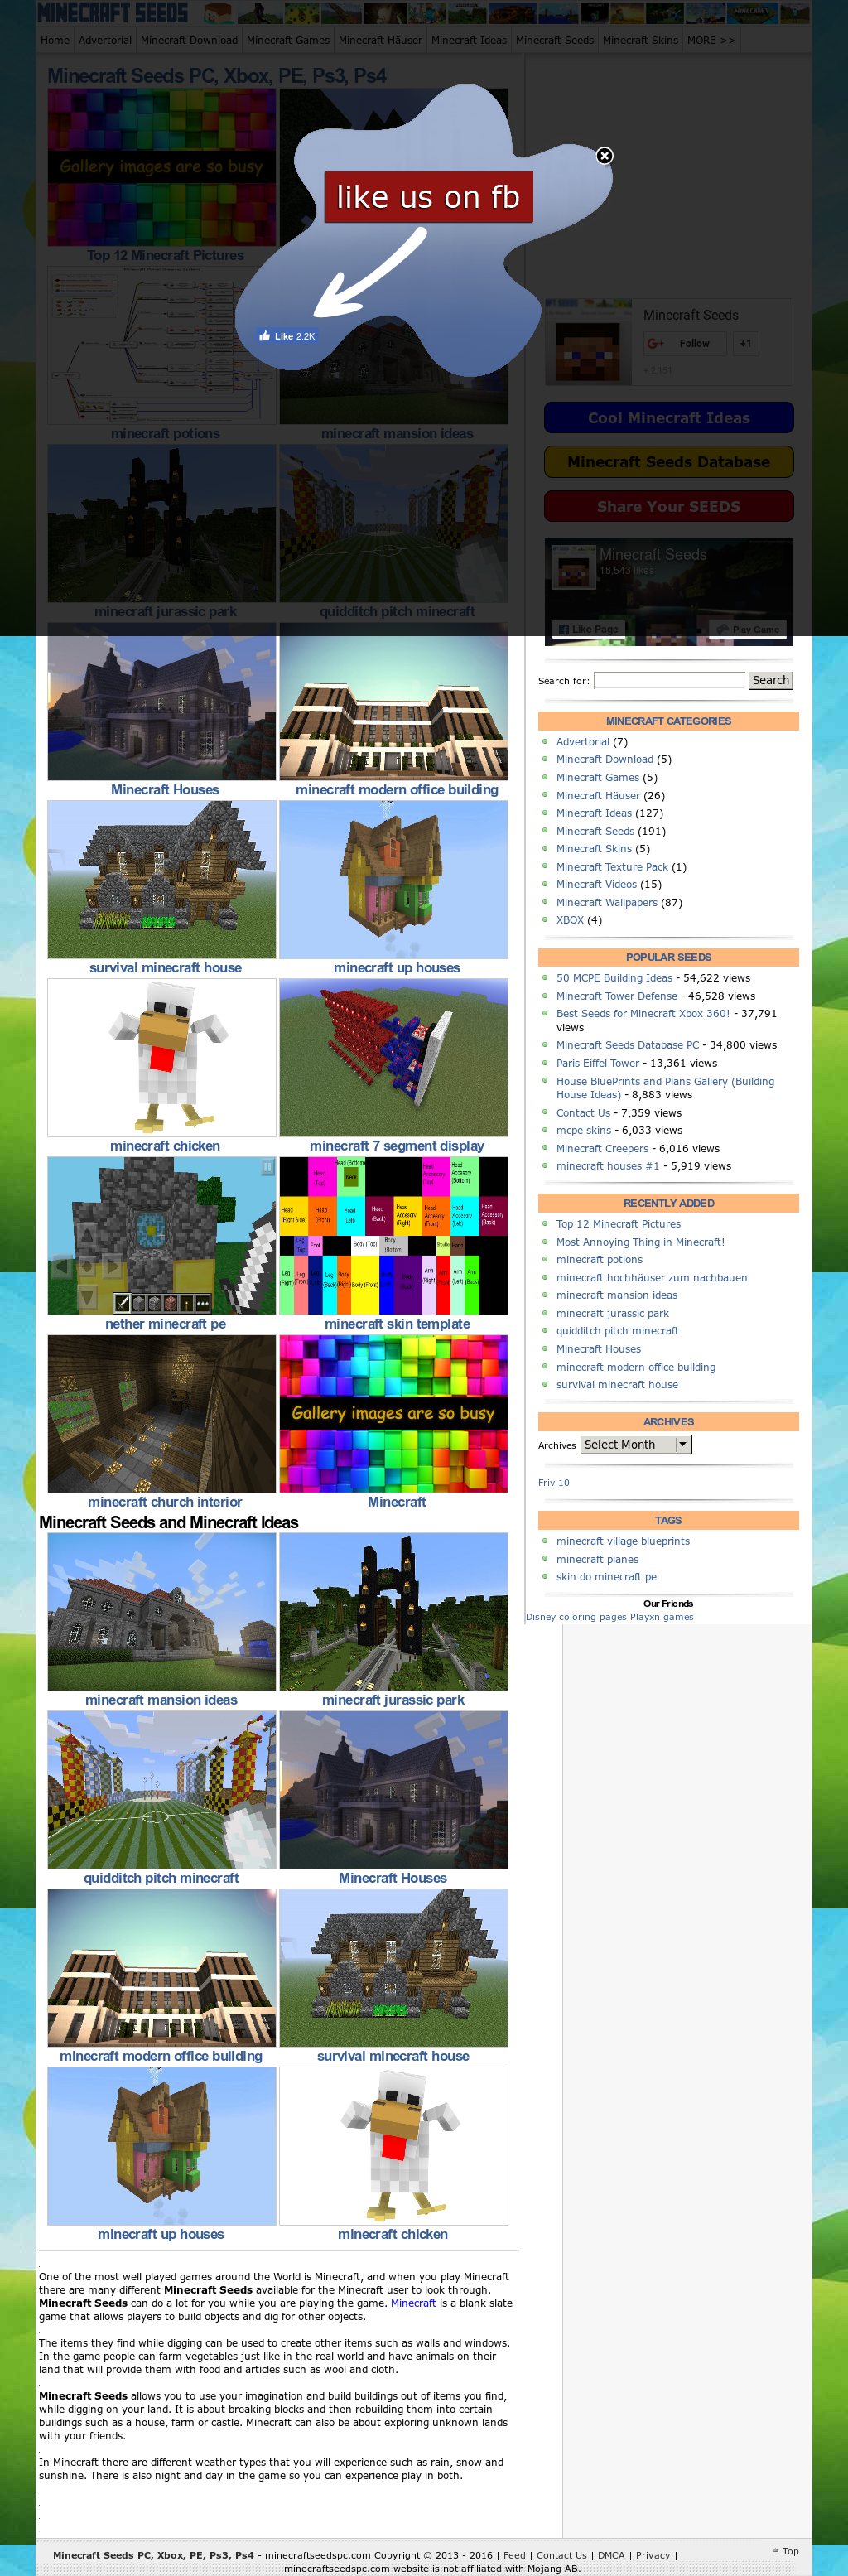 Minecraftseedslist Competitors, Revenue and Employees